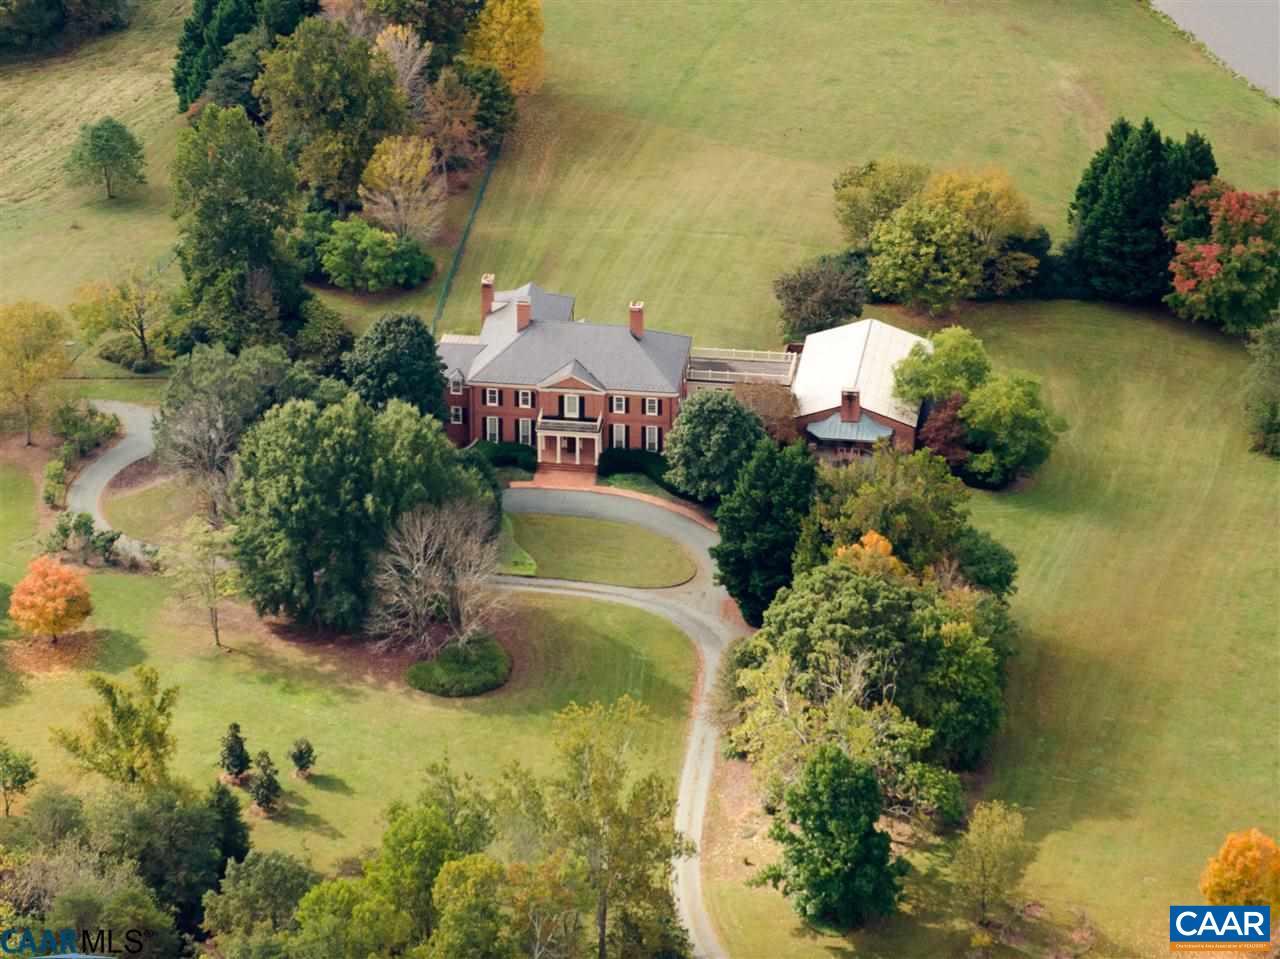 home for sale , MLS #528320, 4503 Mount Air Farm